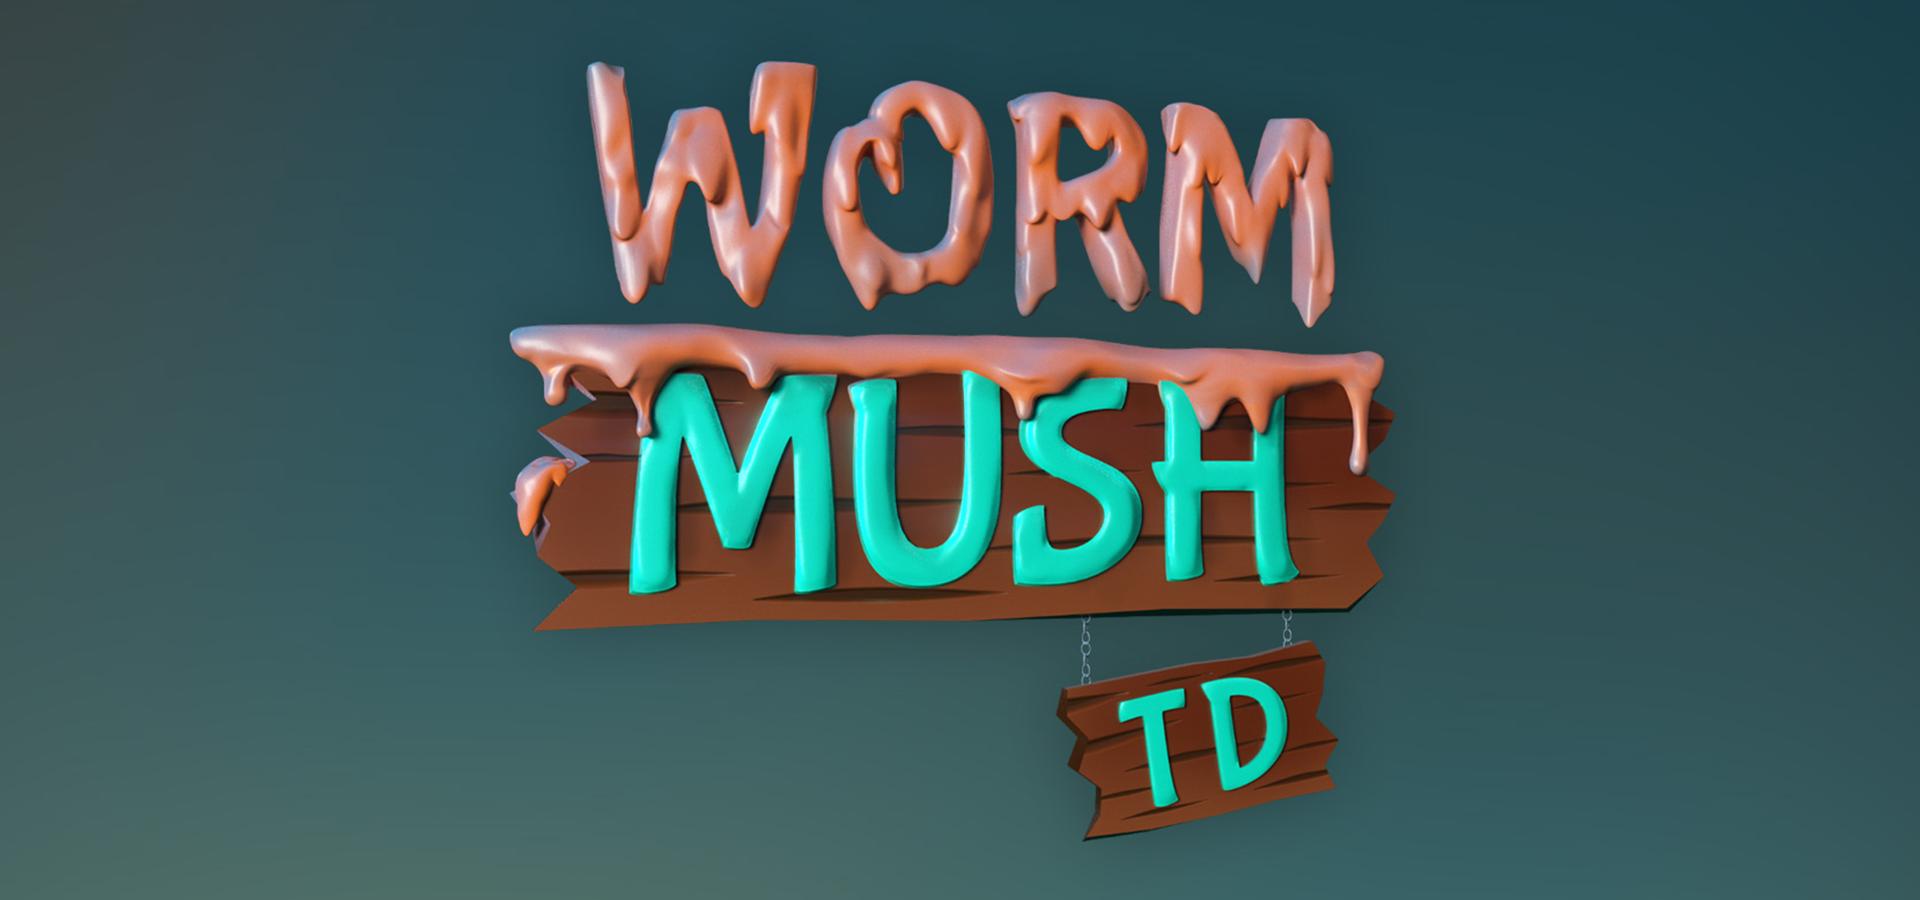 Worm Mush TD